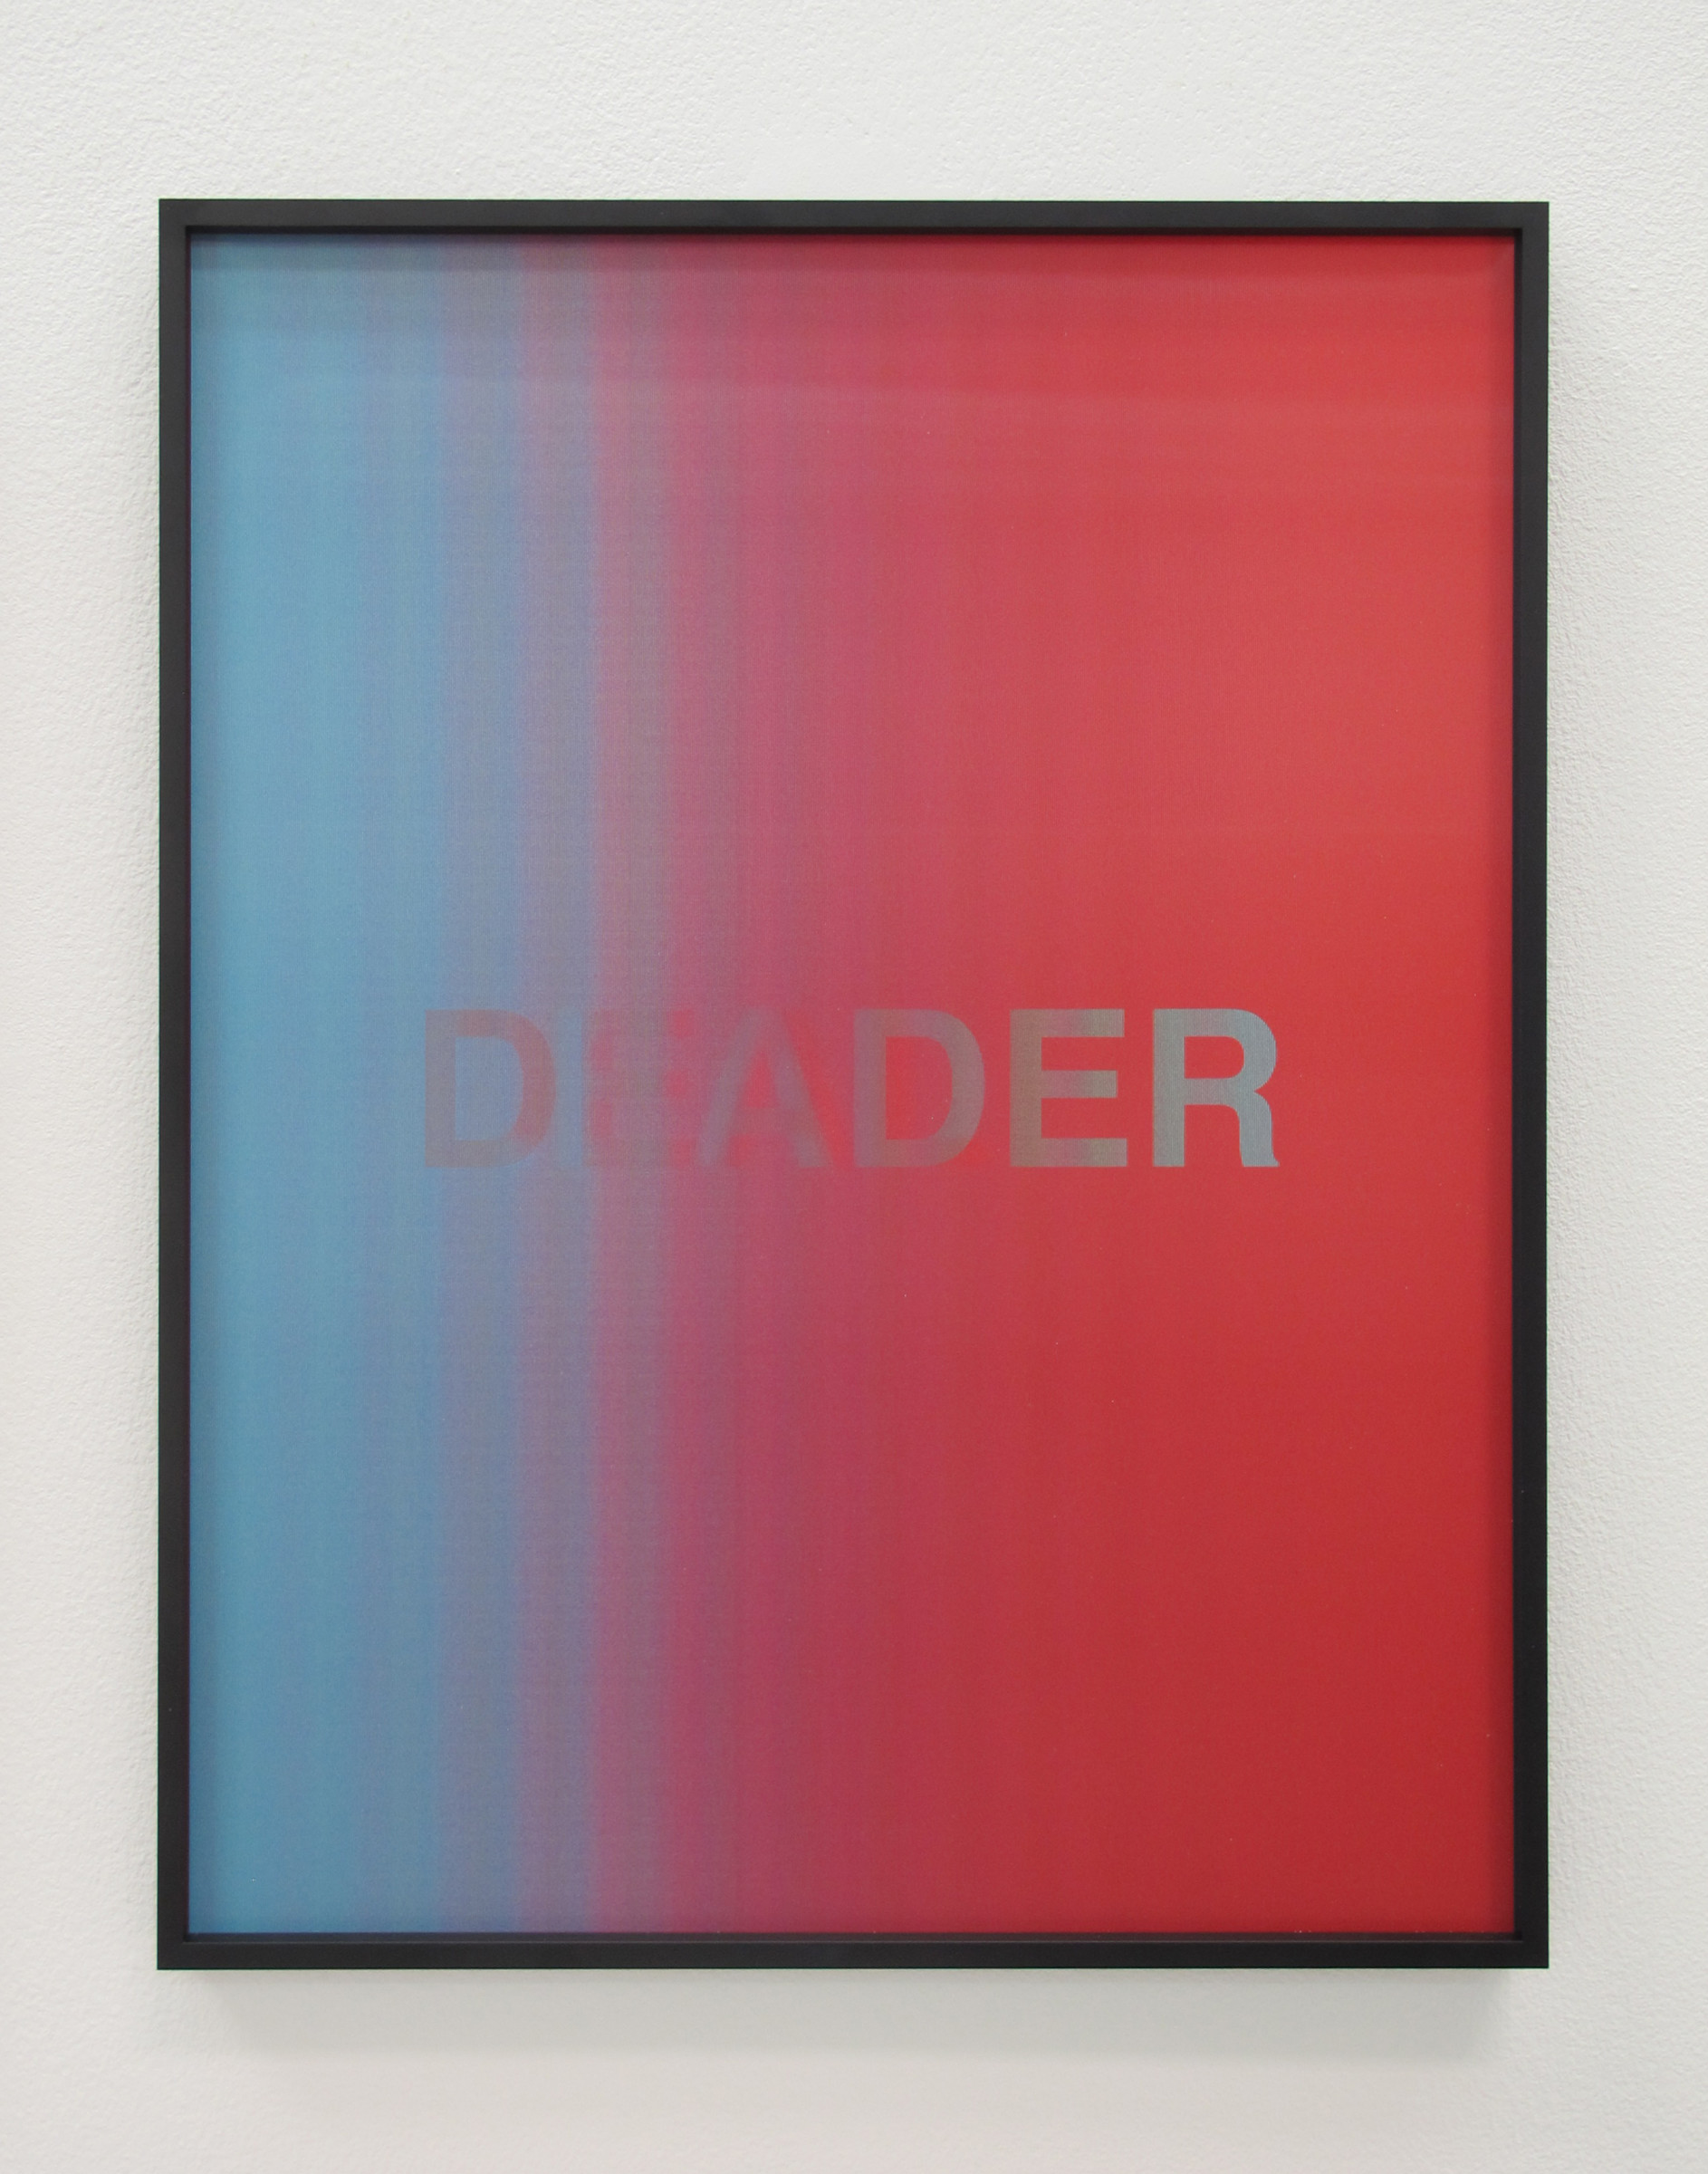 <span class=&#34;link fancybox-details-link&#34;><a href=&#34;/exhibitions/41/works/artworks1584/&#34;>View Detail Page</a></span><div class=&#34;medium&#34;> HD lenticular print</div> <div class=&#34;dimensions&#34;>50 x 40 cm<br /> 19 3/4 x 15 3/4 in</div> <div class=&#34;edition_details&#34;>Edition of 3 + 1 AP</div>